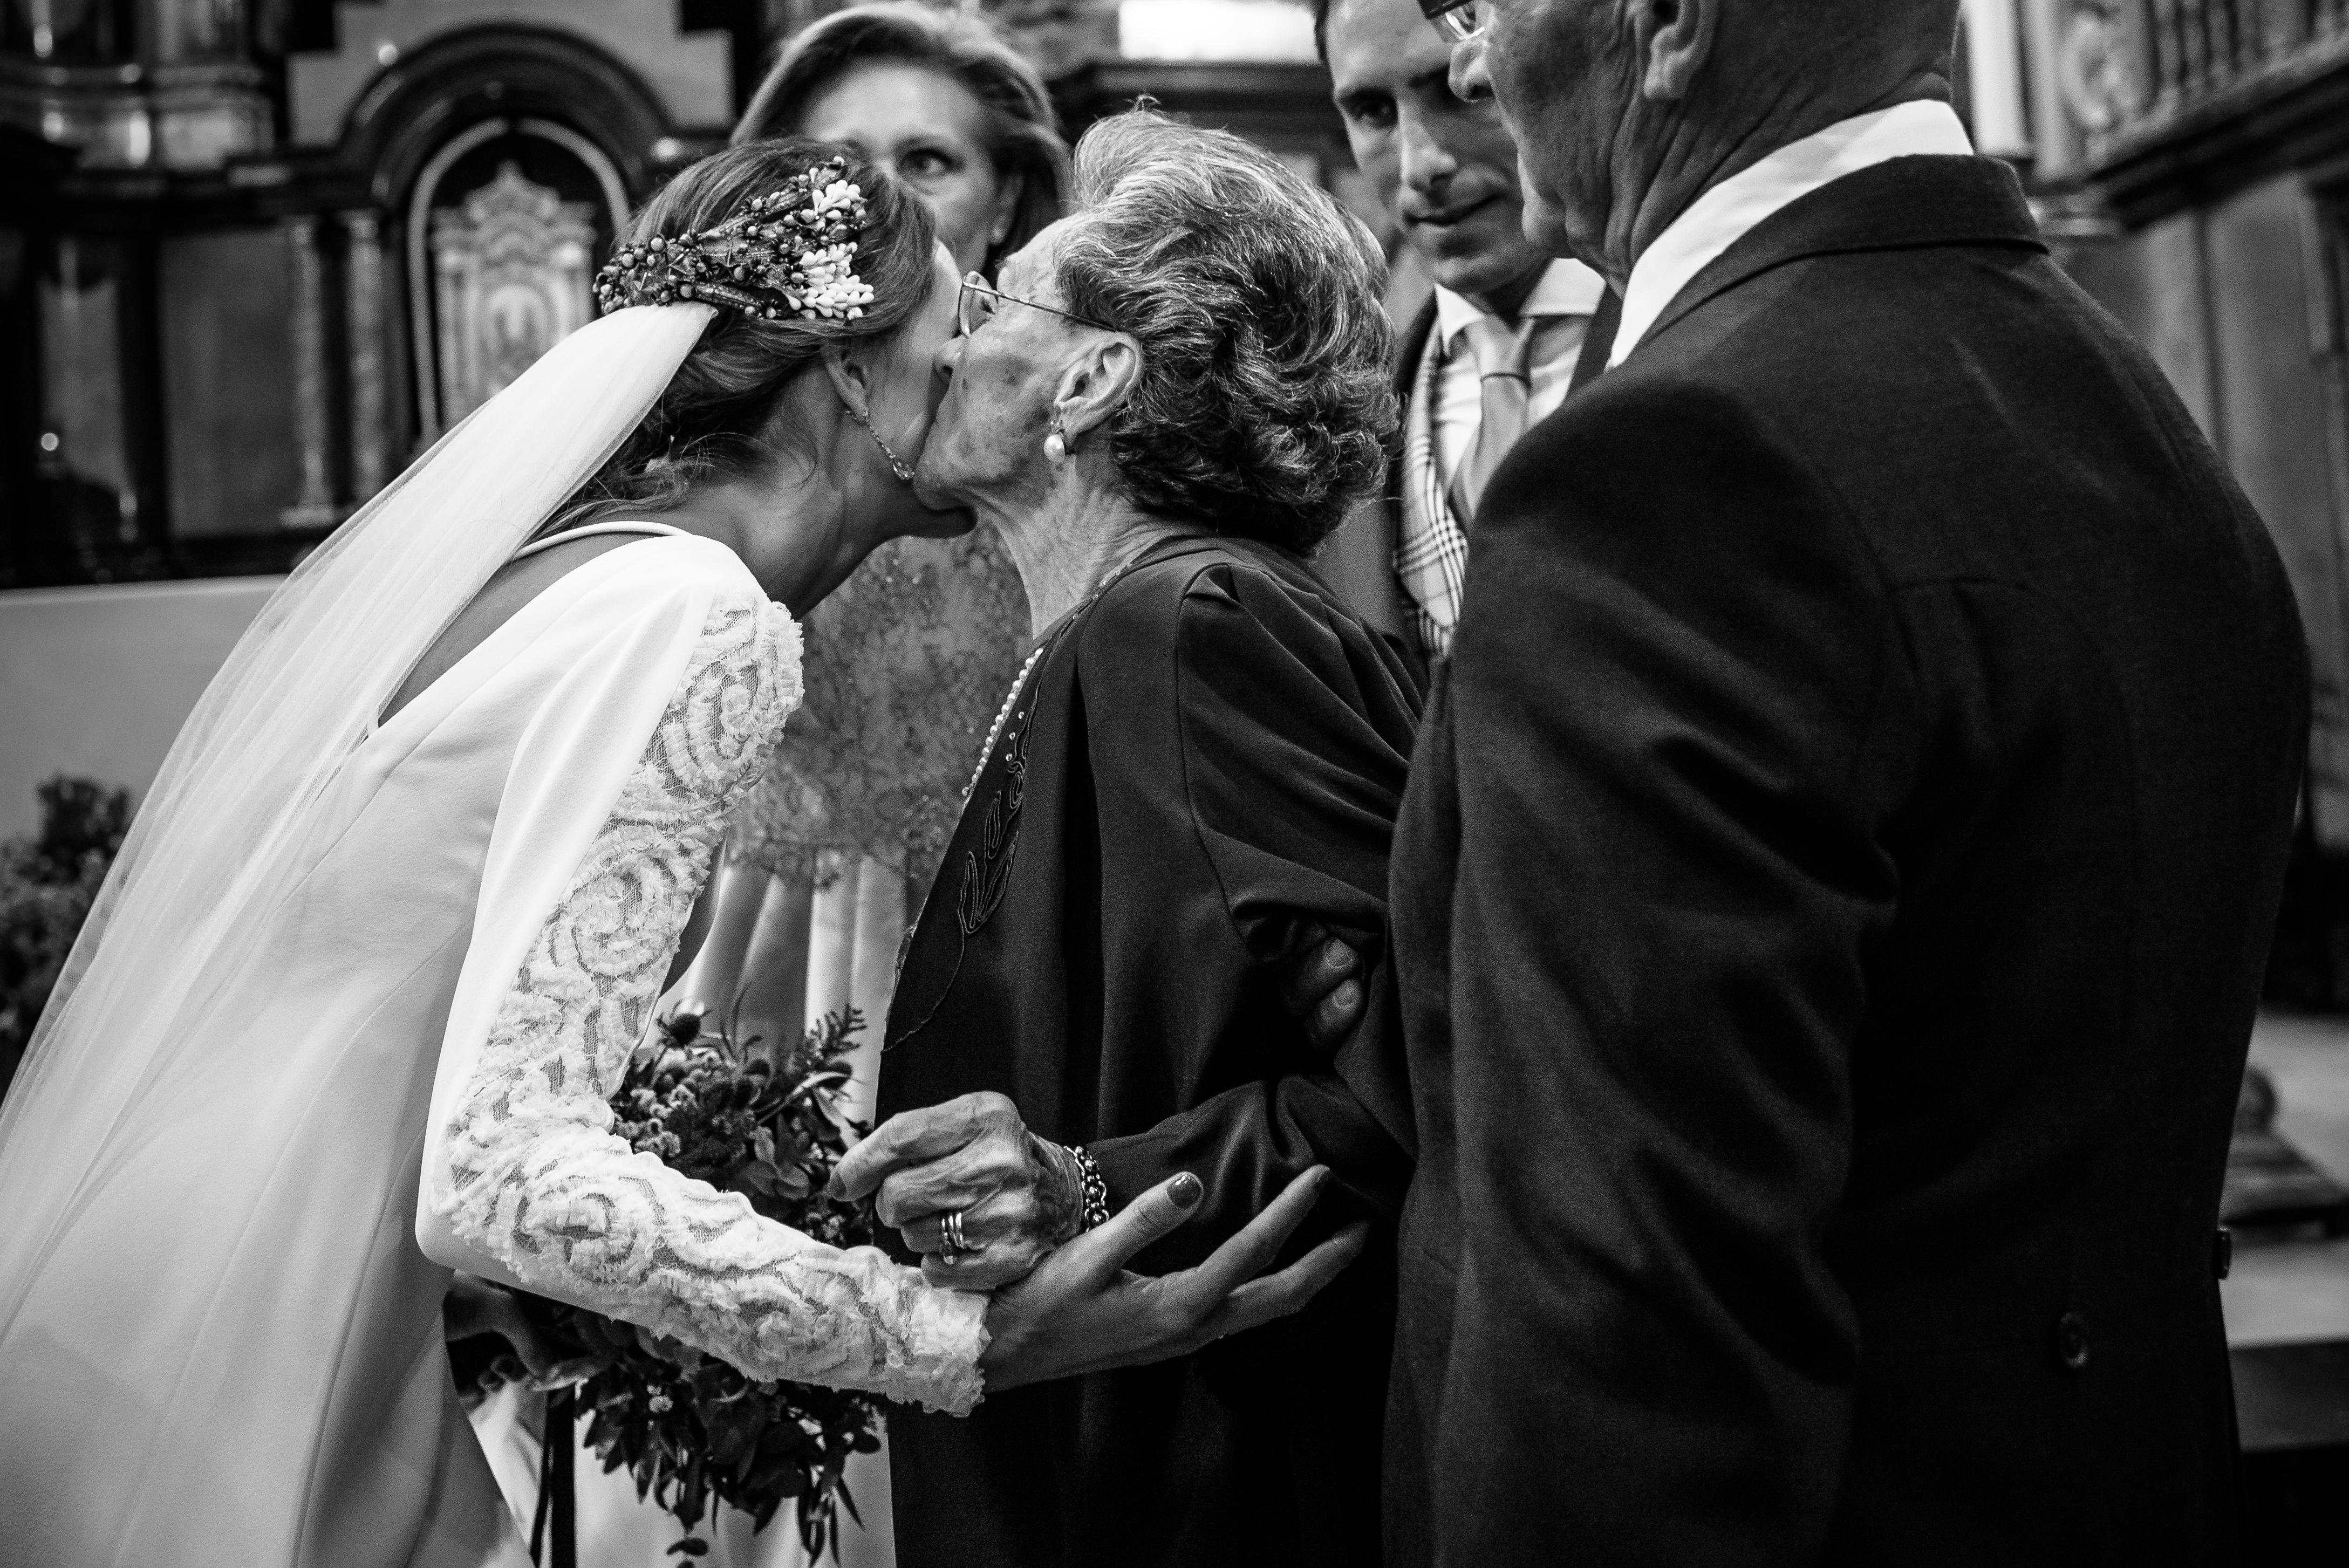 mandarina weddig, fotografos de boda, fotografo boda soria, fotografo boda barcelona, fotografo boda Madrid, fotografo boda lerida, fotografo boda Huesca_36